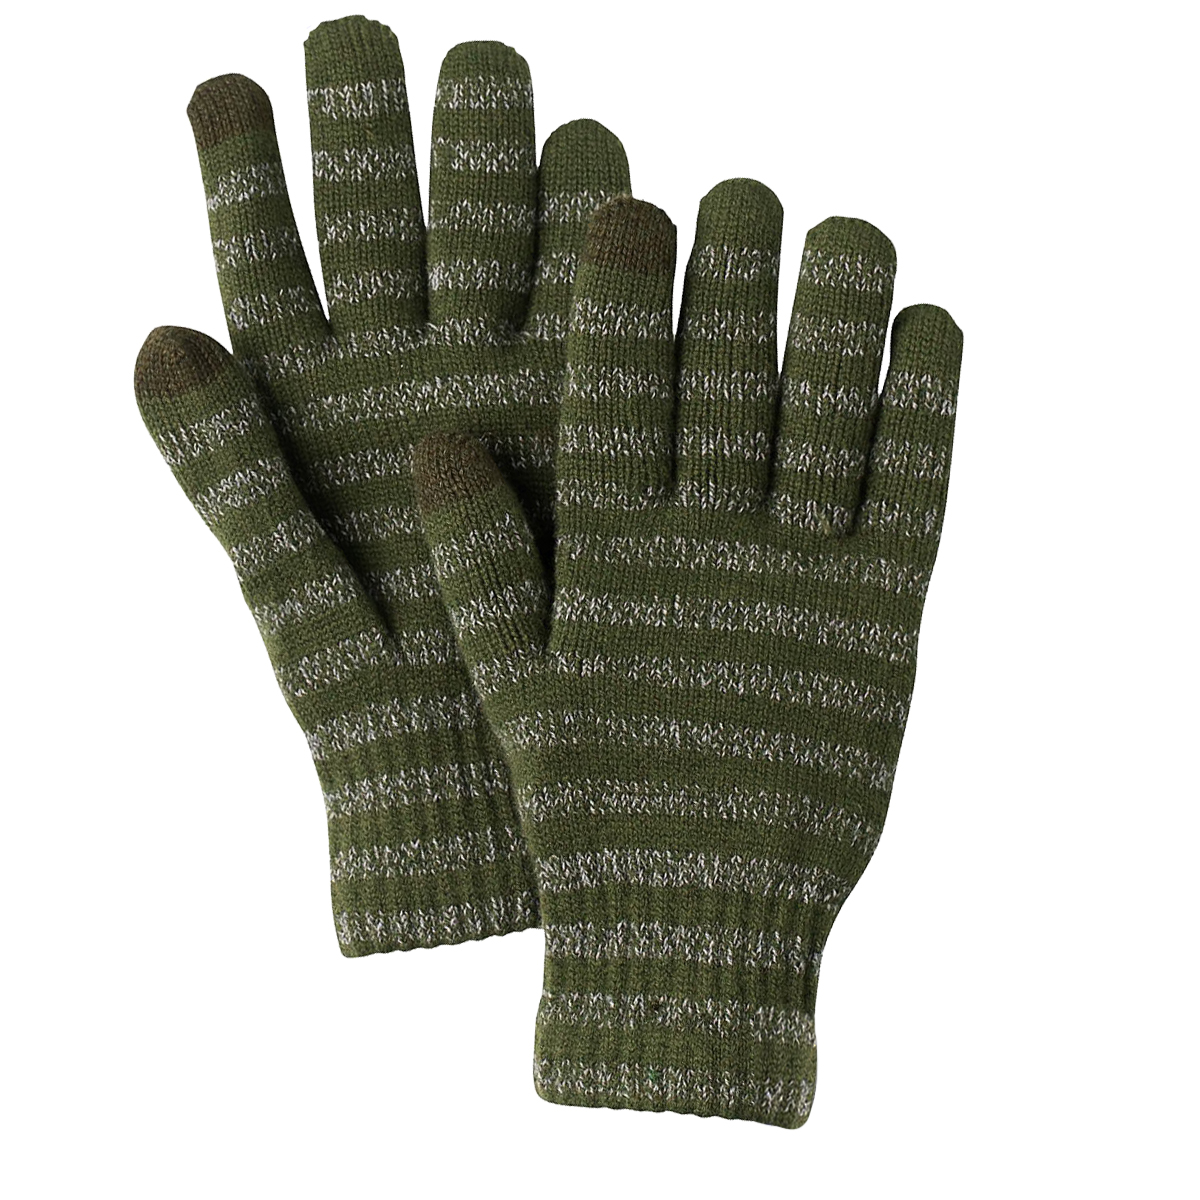 Merino Wool Touch Screen Glove/MWG-004-G